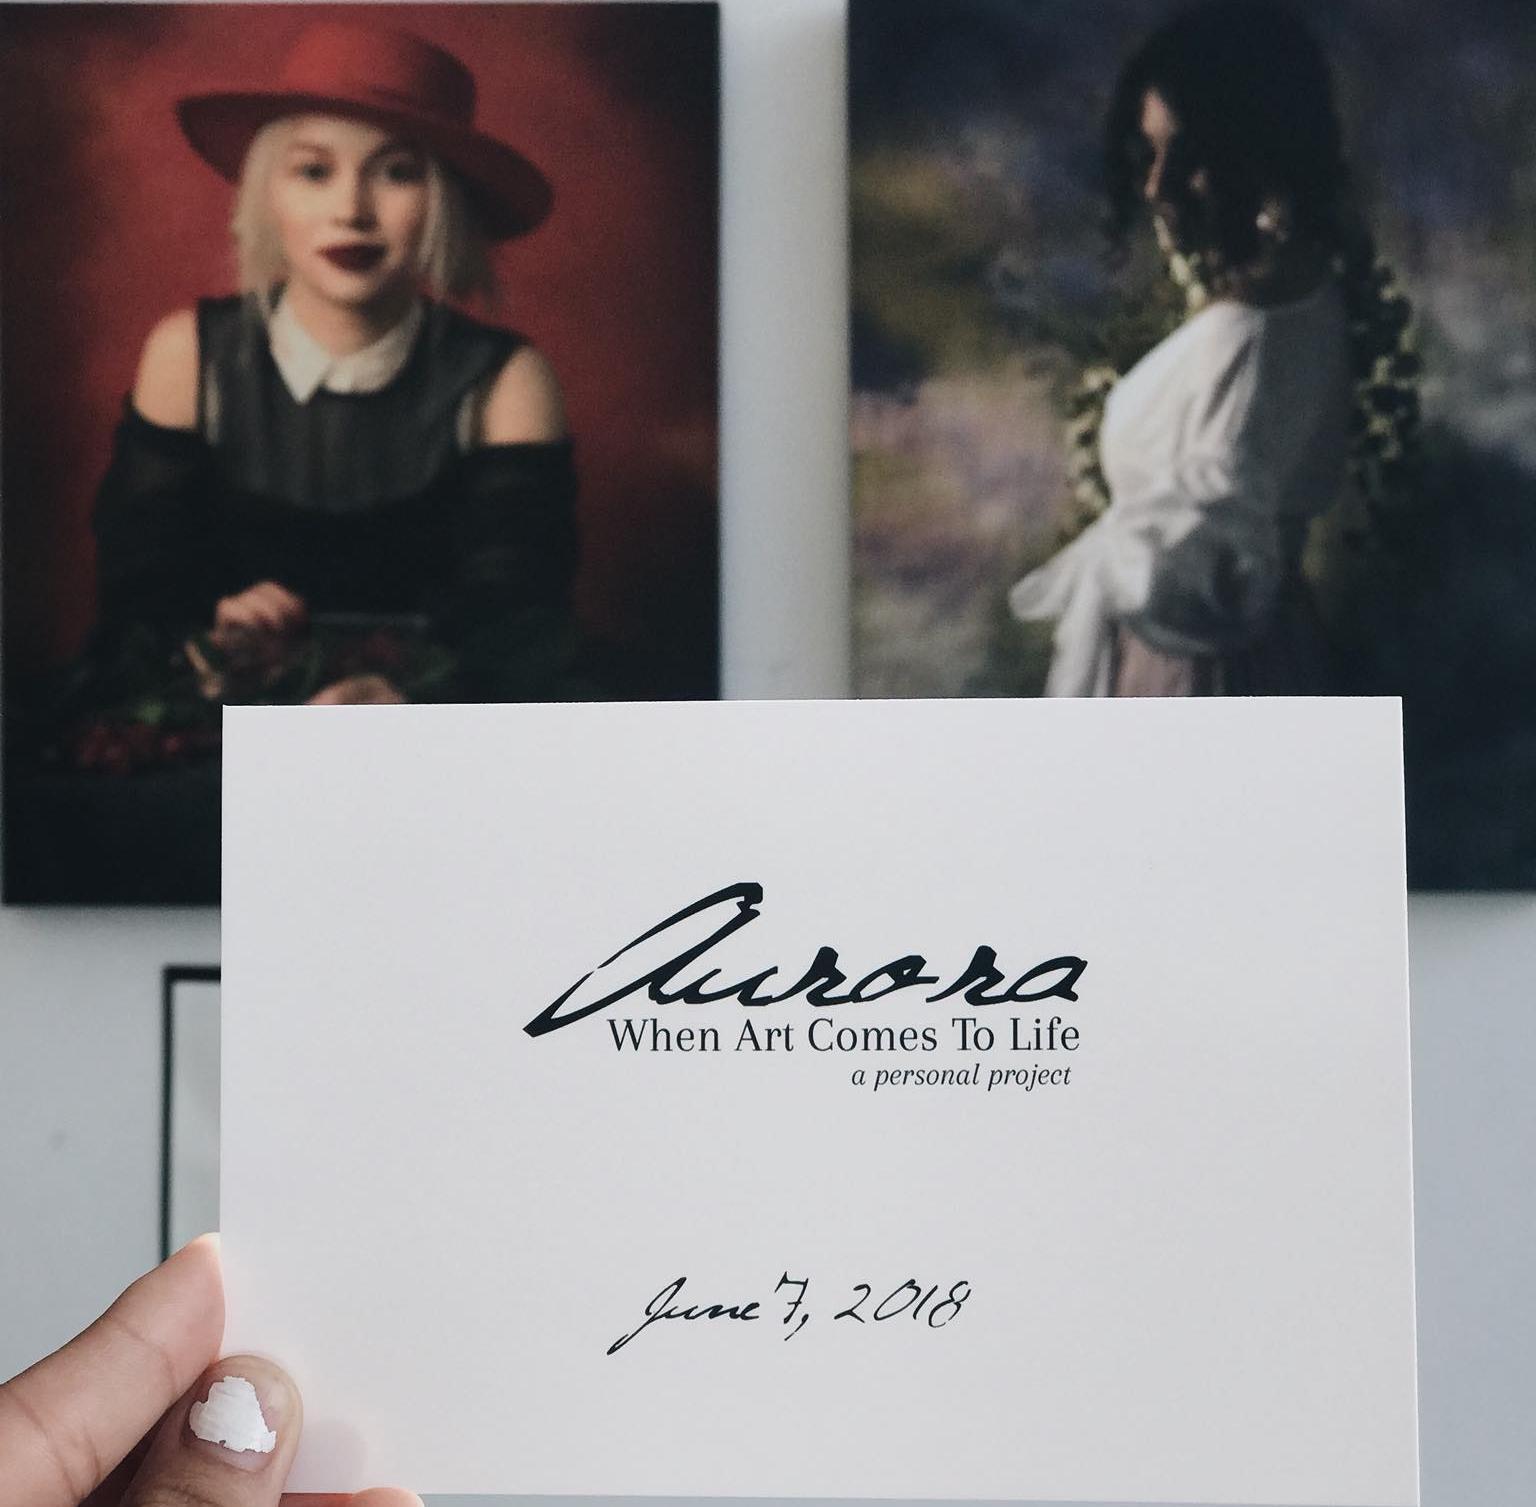 Aurora: When Art Comes to Life